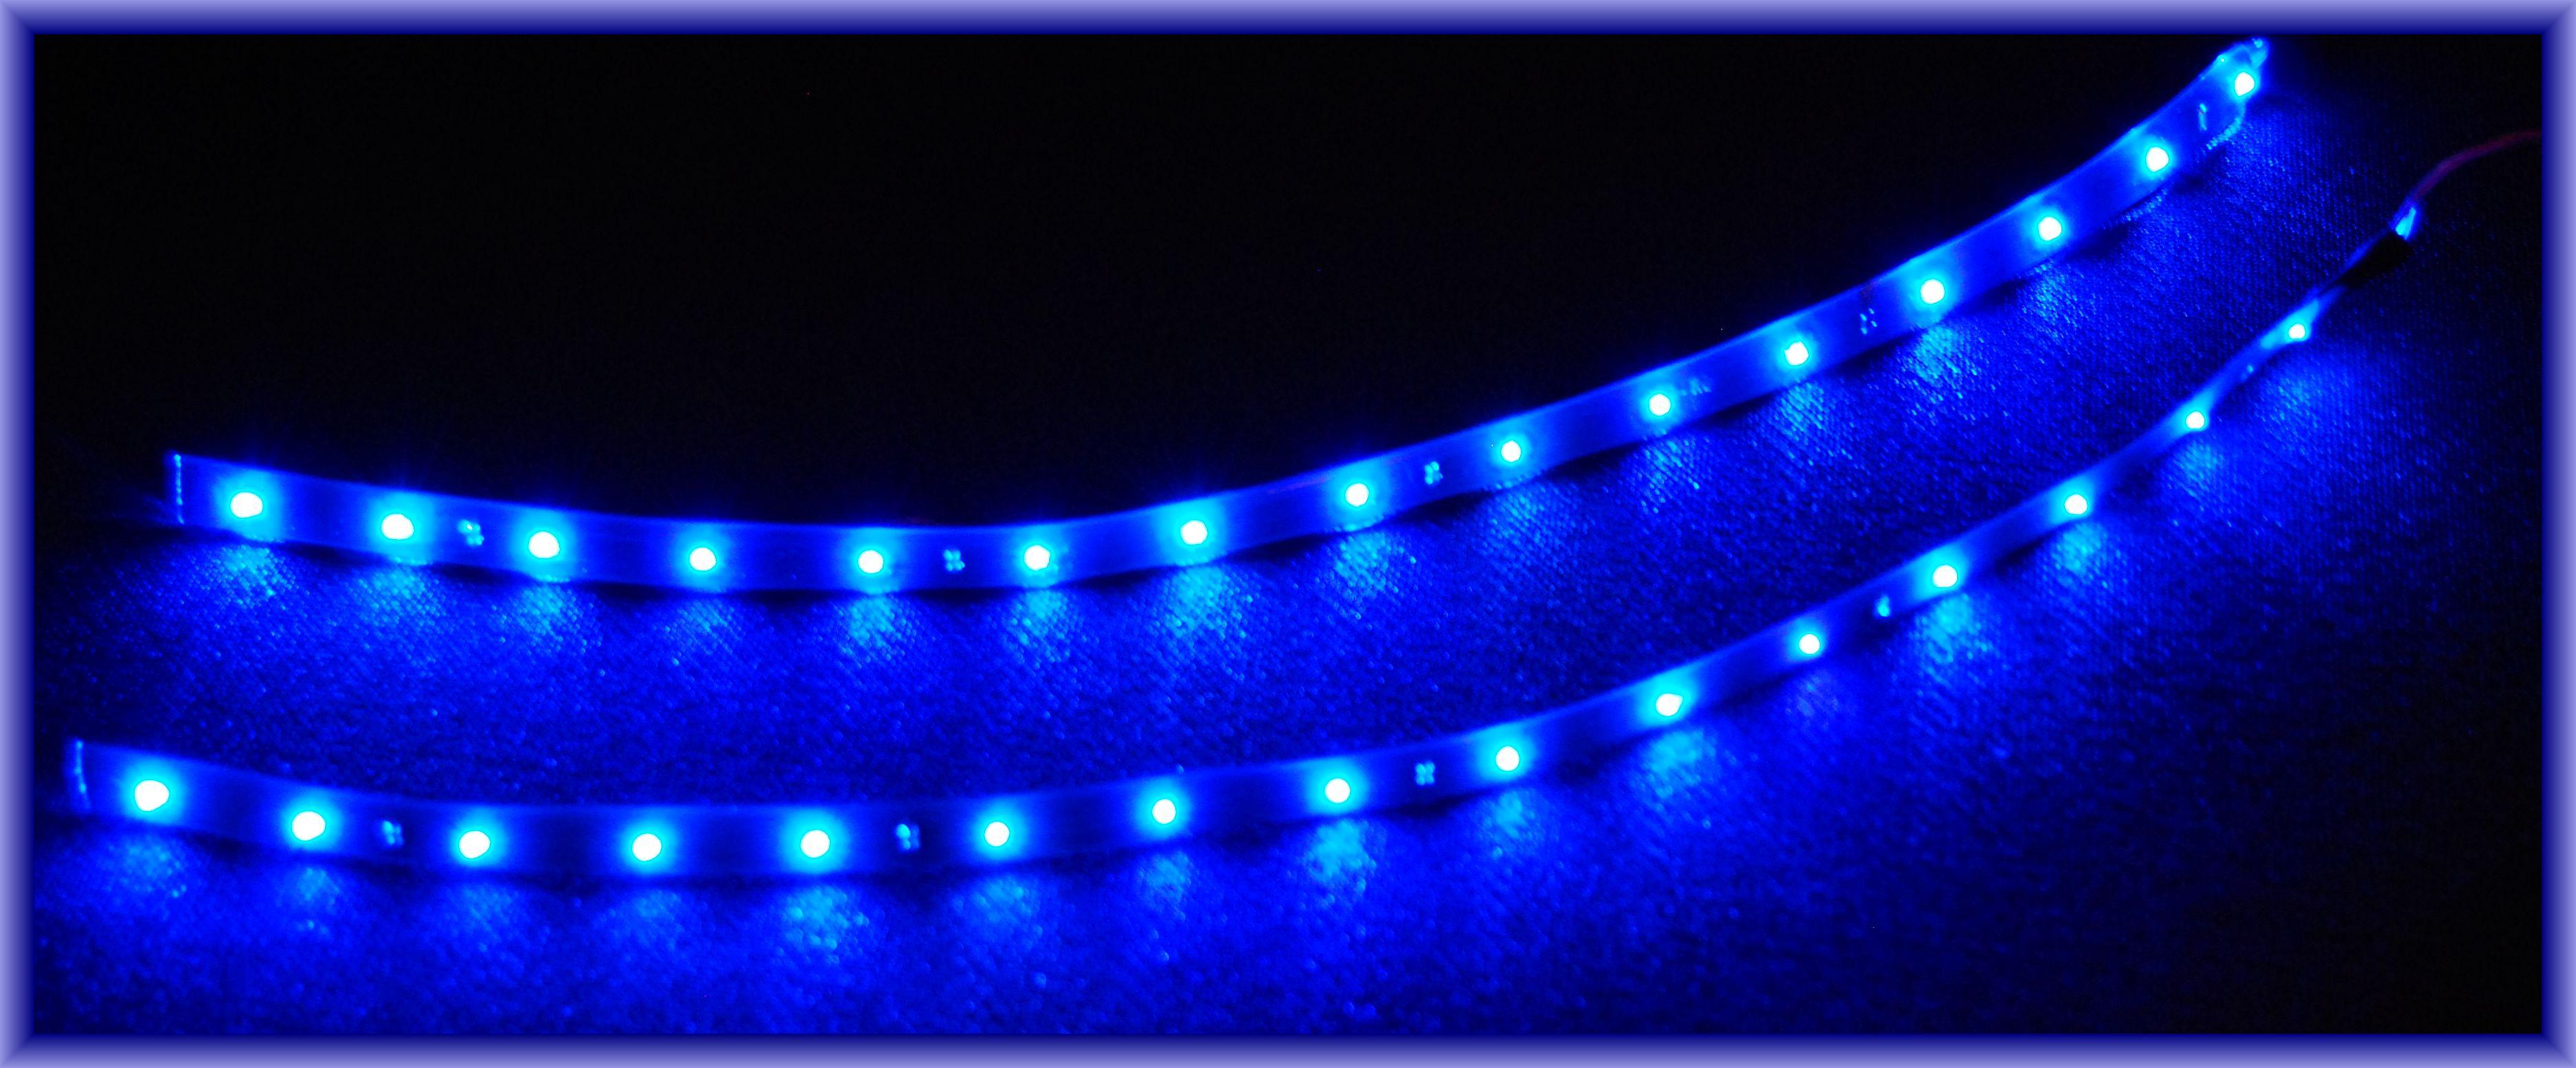 3 x 30cm pc beleuchtung led blau pc licht incl kabel ebay